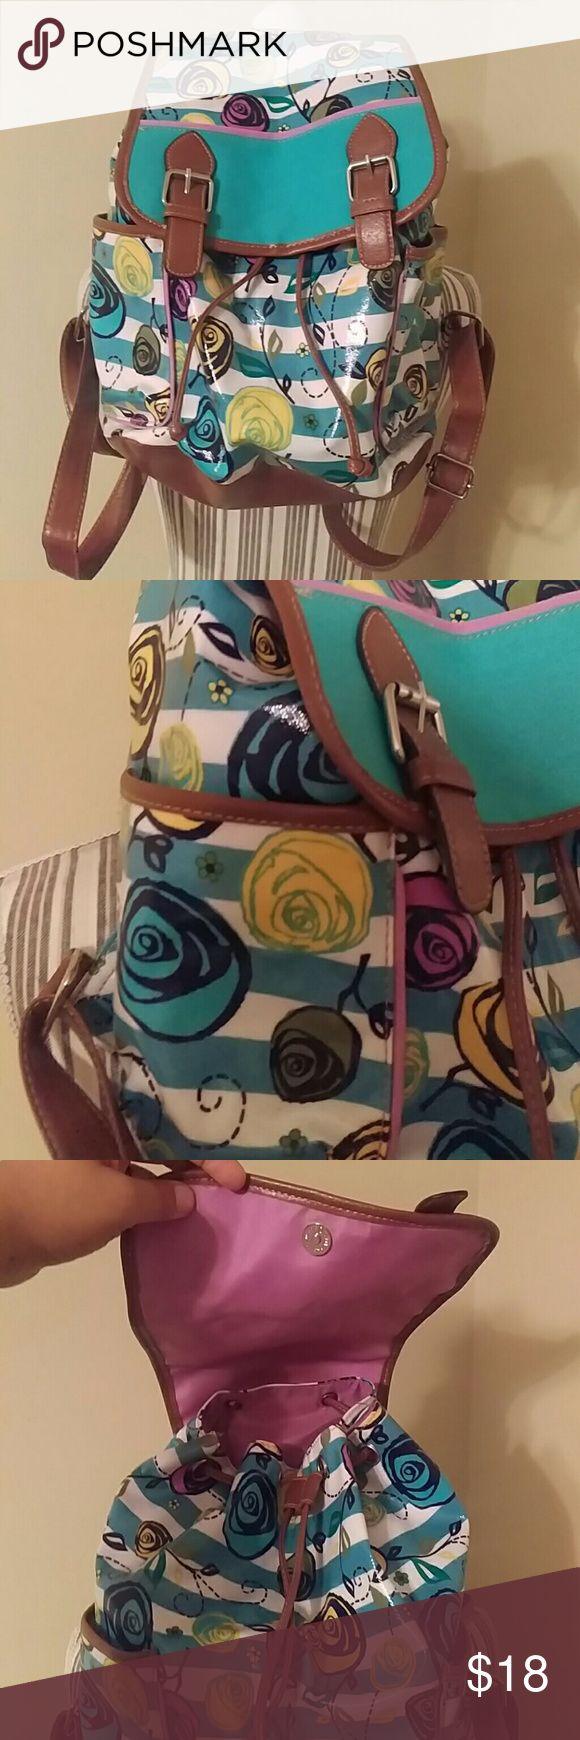 EUC! Faux Leather/Vegan Pull Tie Bookbag/Purse EUC! Faux Leather/Vegan Pull Tie Bookbag/Purse So freaking cute! Multi color with purple on the inside Floral design.  Medium sized bag Bags Backpacks